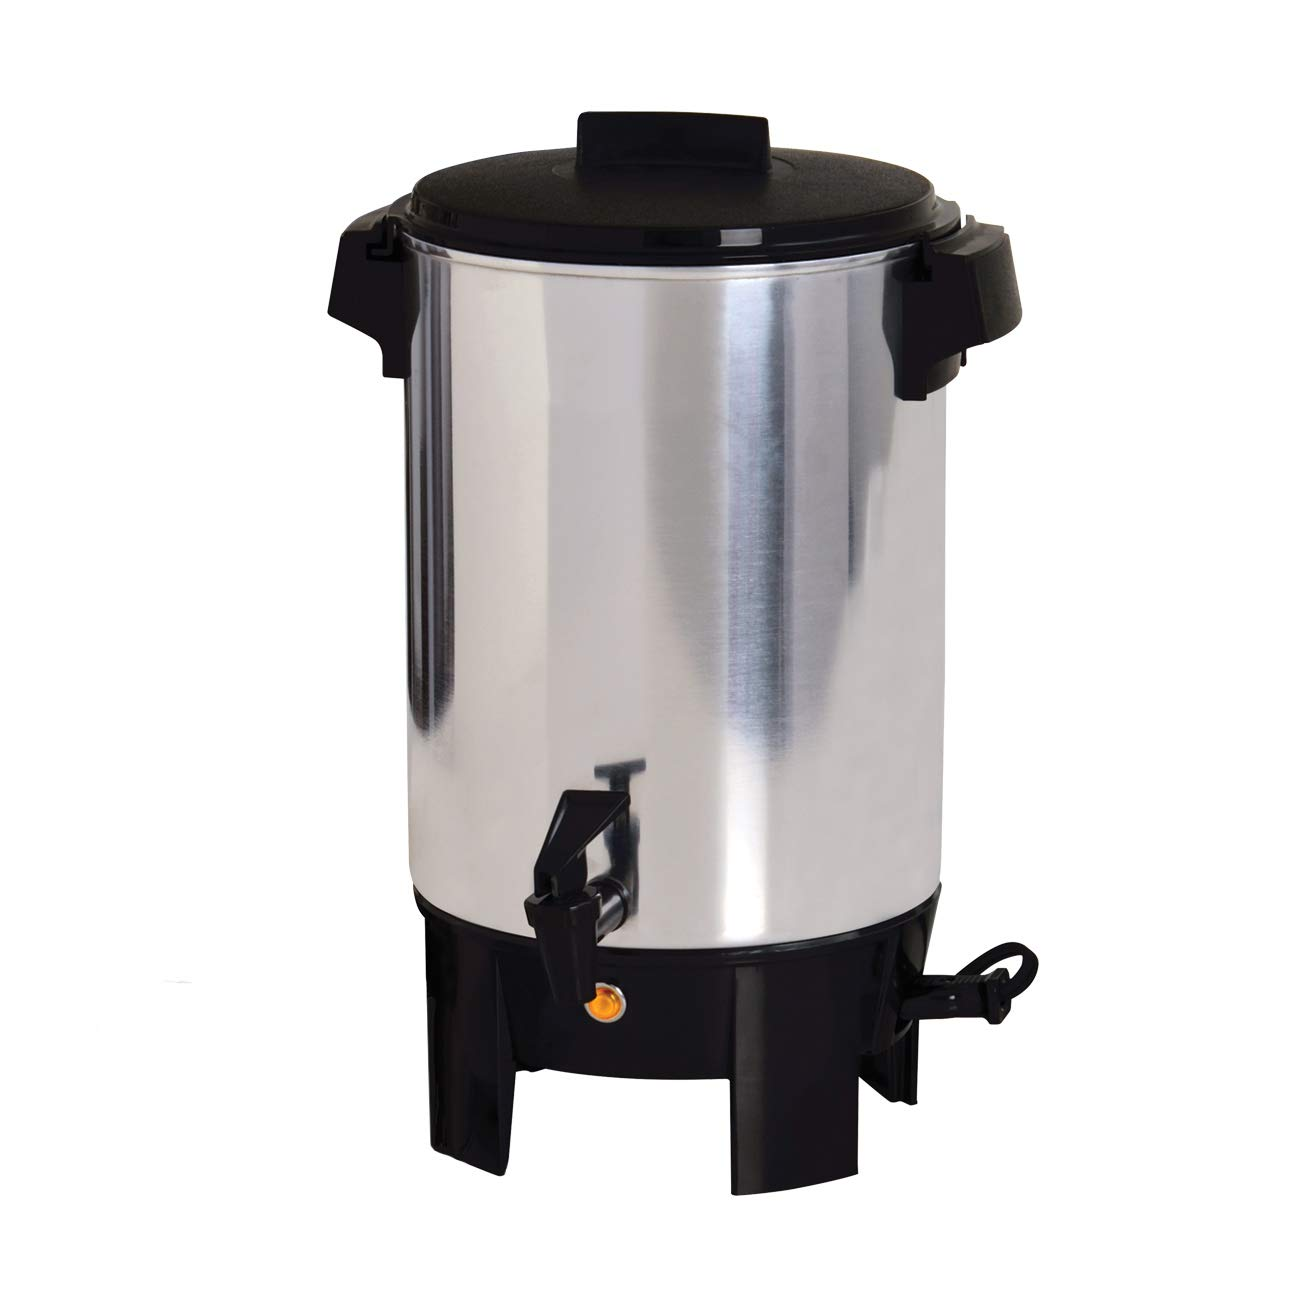 Focus Foodservice FCMLA030 30 Cup Coffee Maker